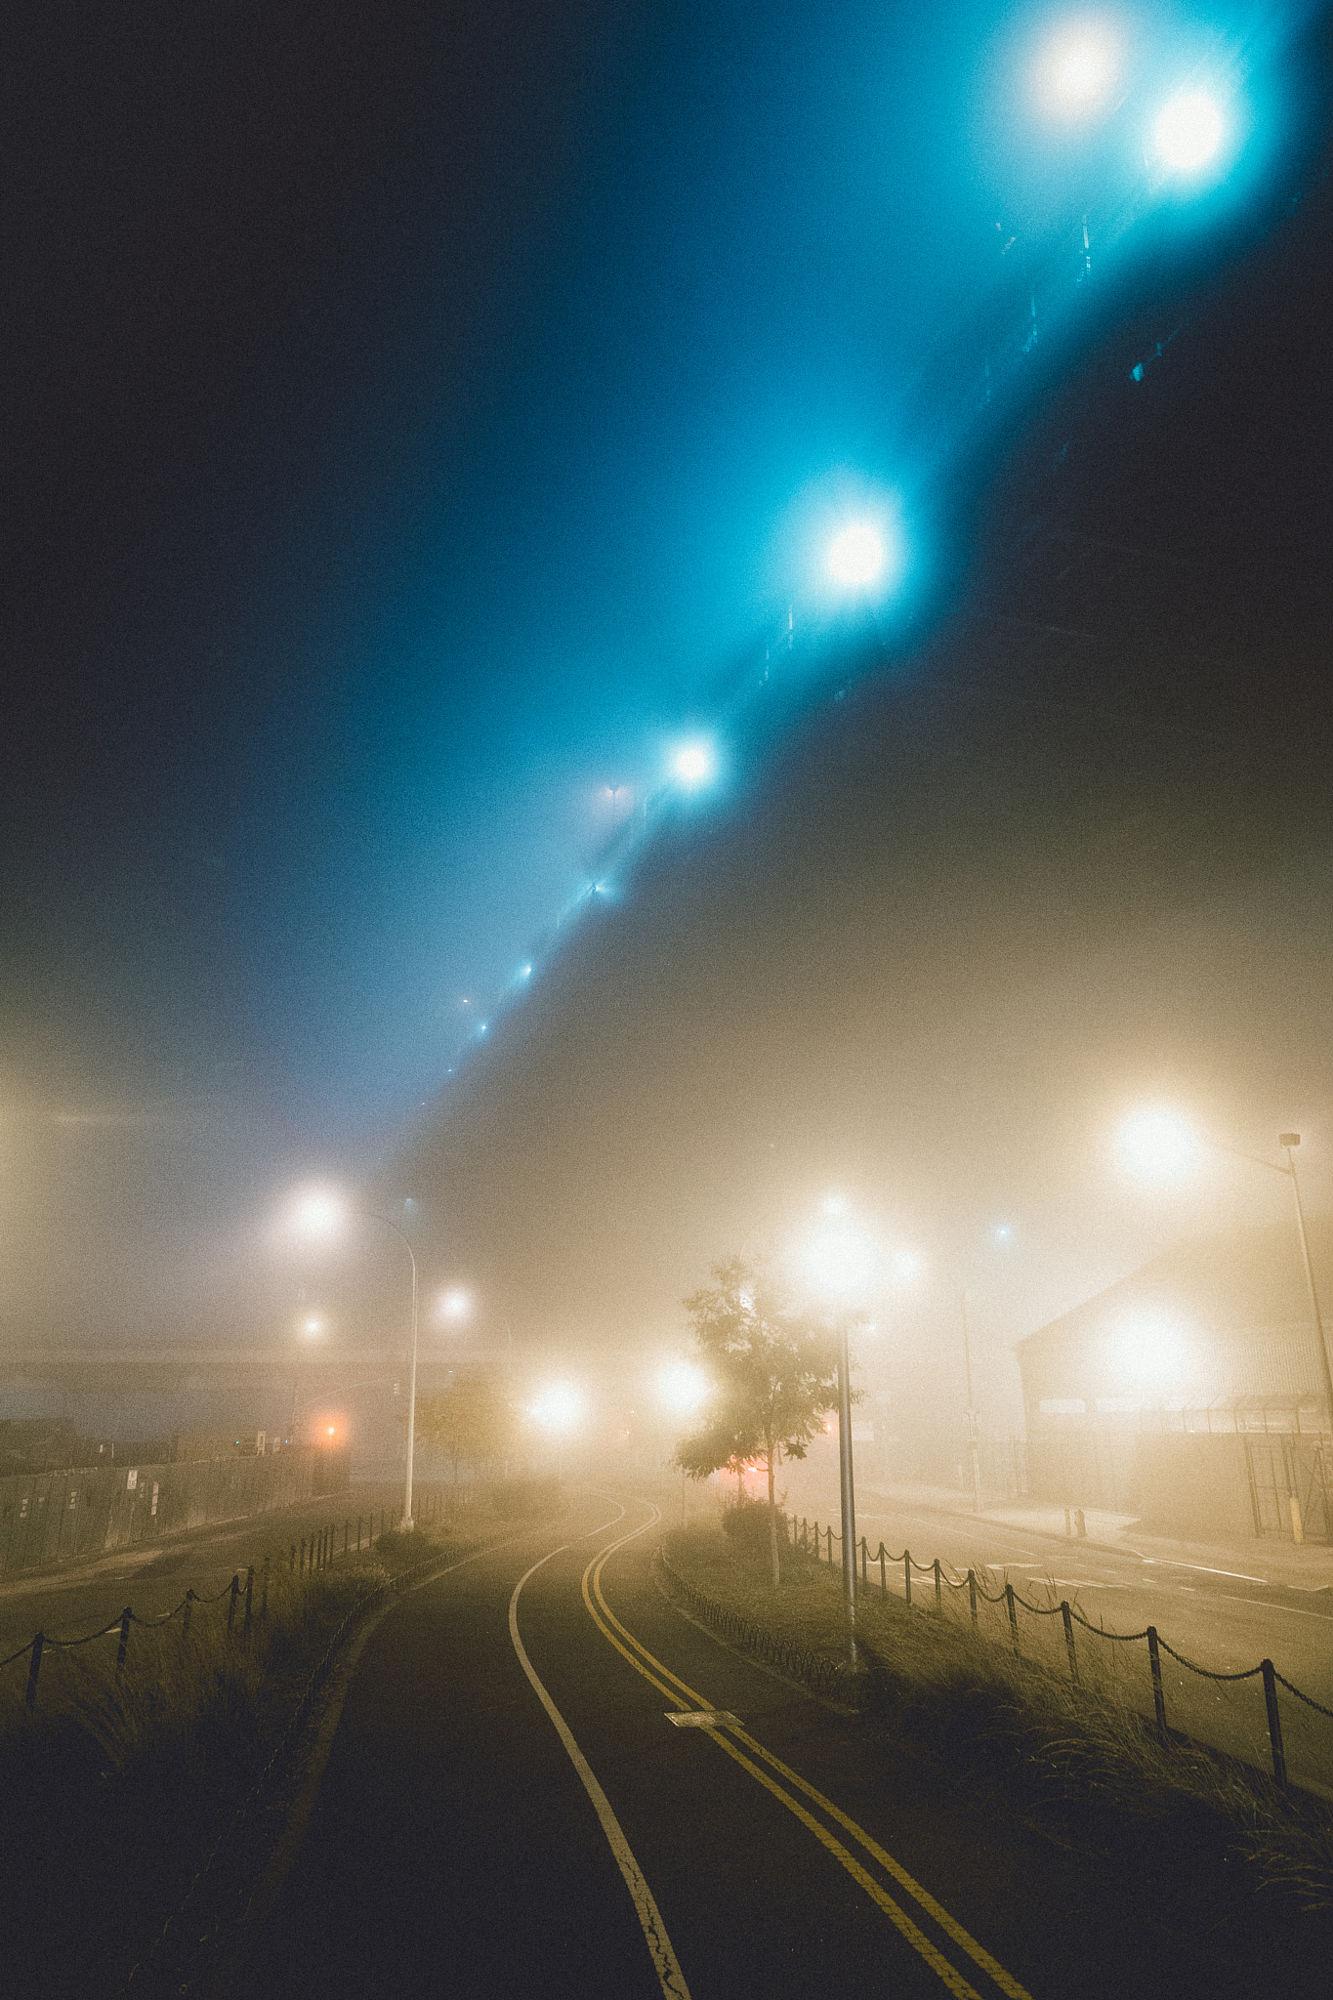 Wallpapers Of The Week Fog